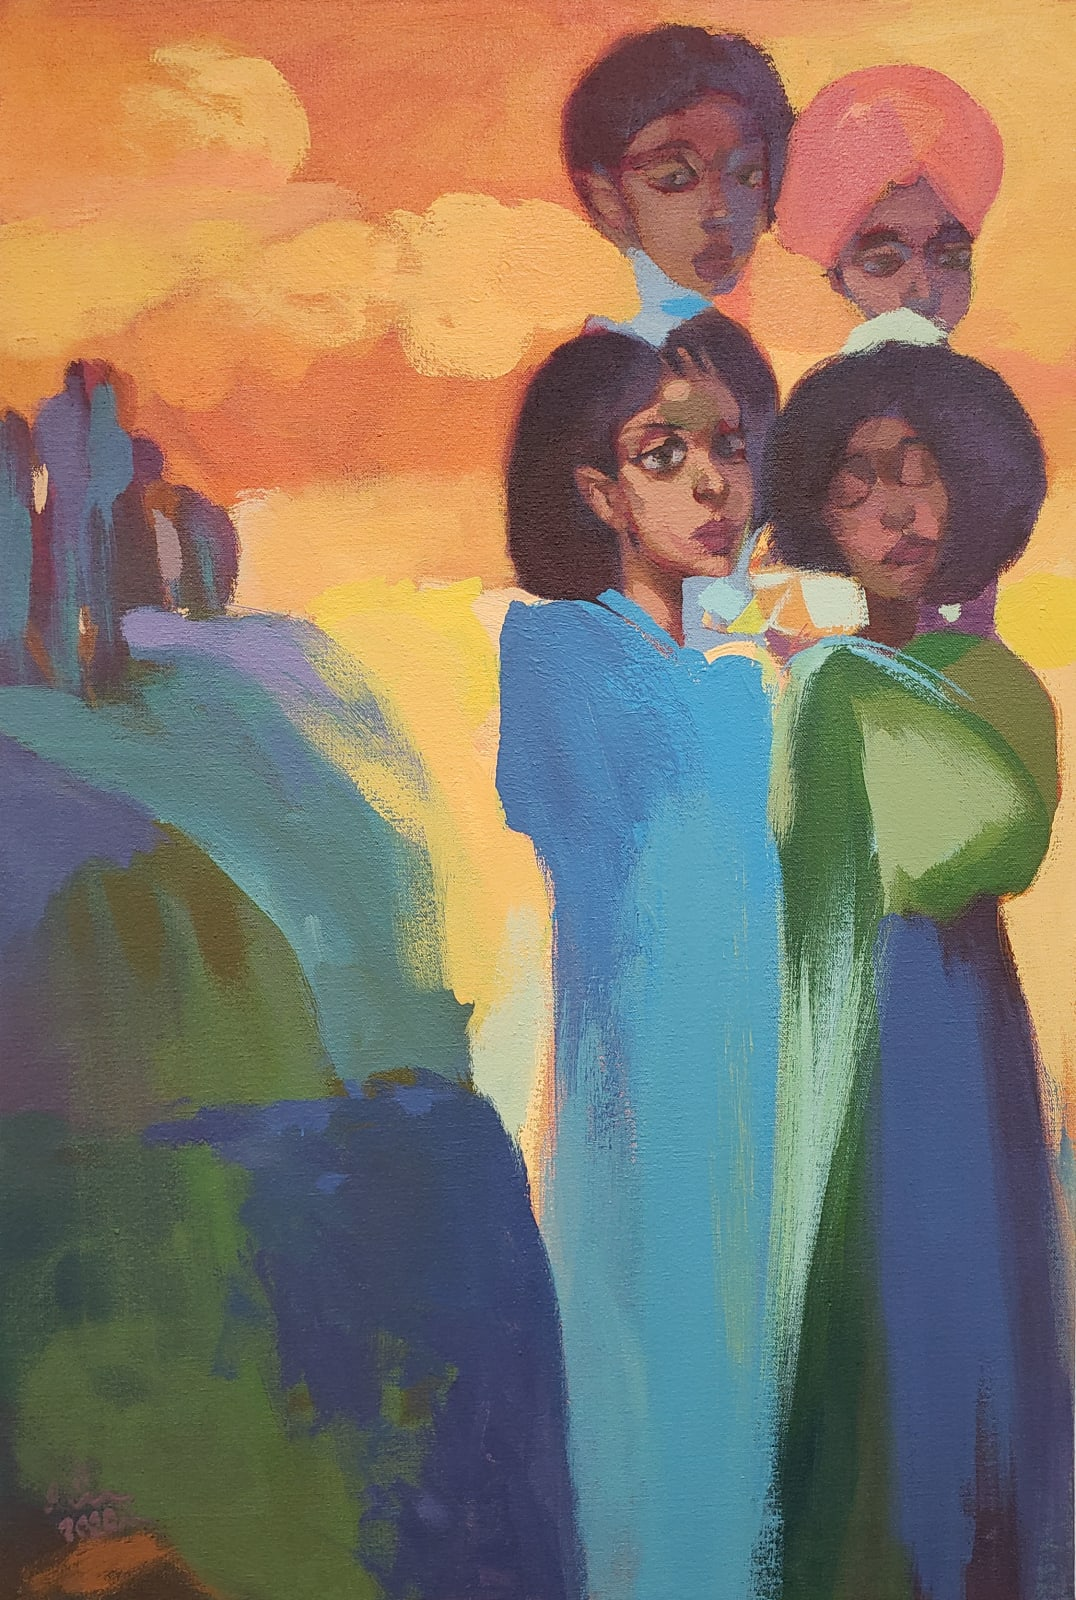 Dereje Demissie, Floating Memories 4, 2020